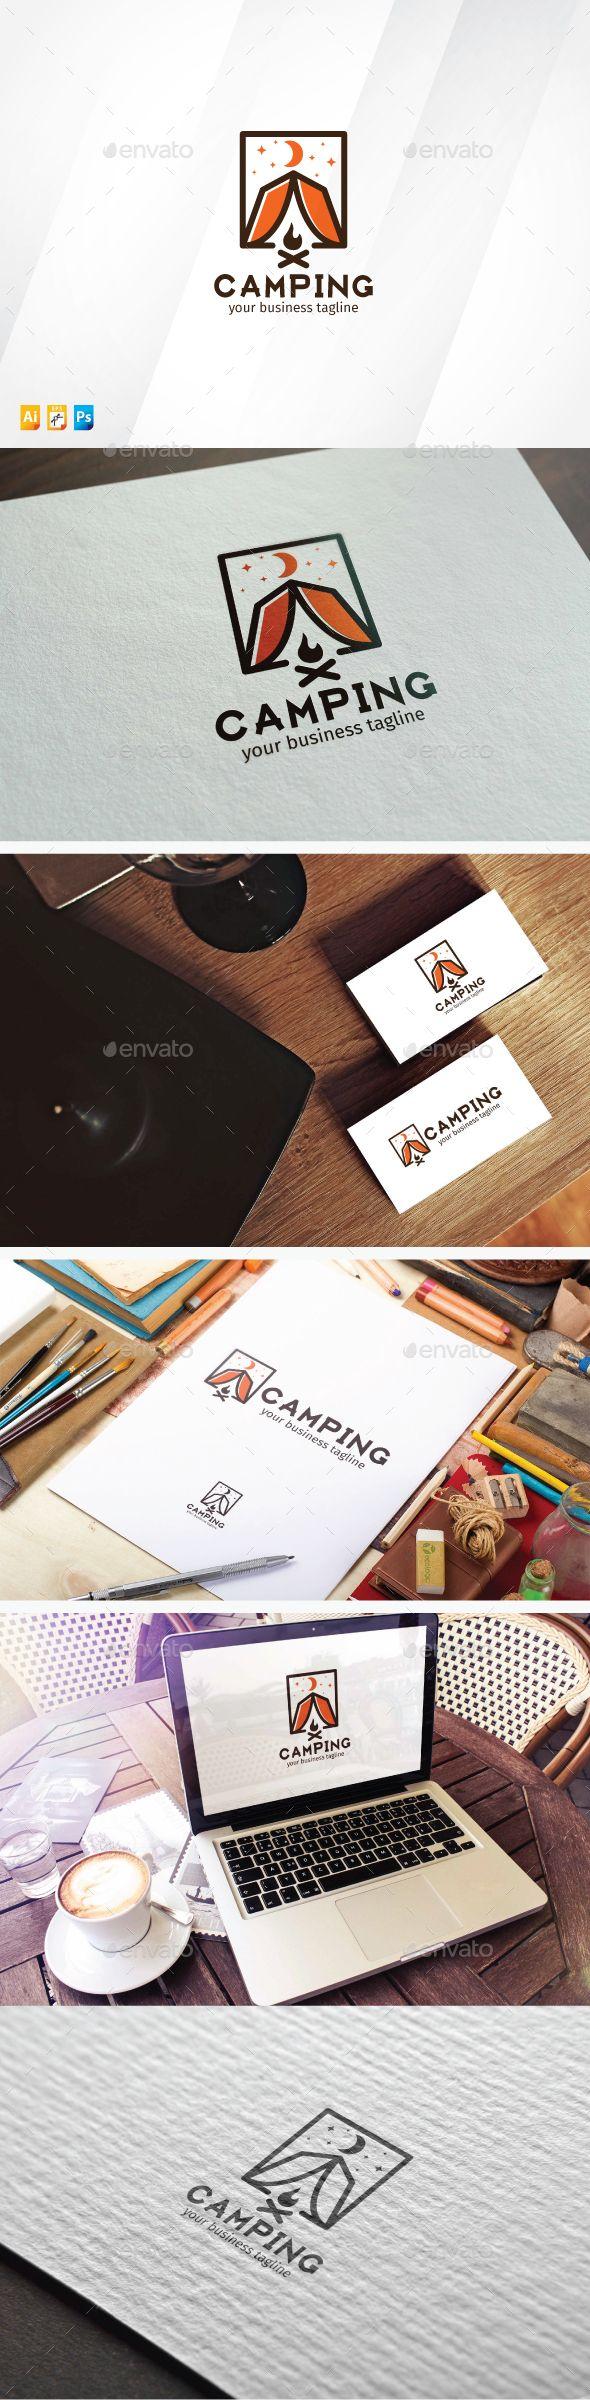 Camping Logo Template #design #logotype Download: http://graphicriver.net/item/camping/13721303?ref=ksioks